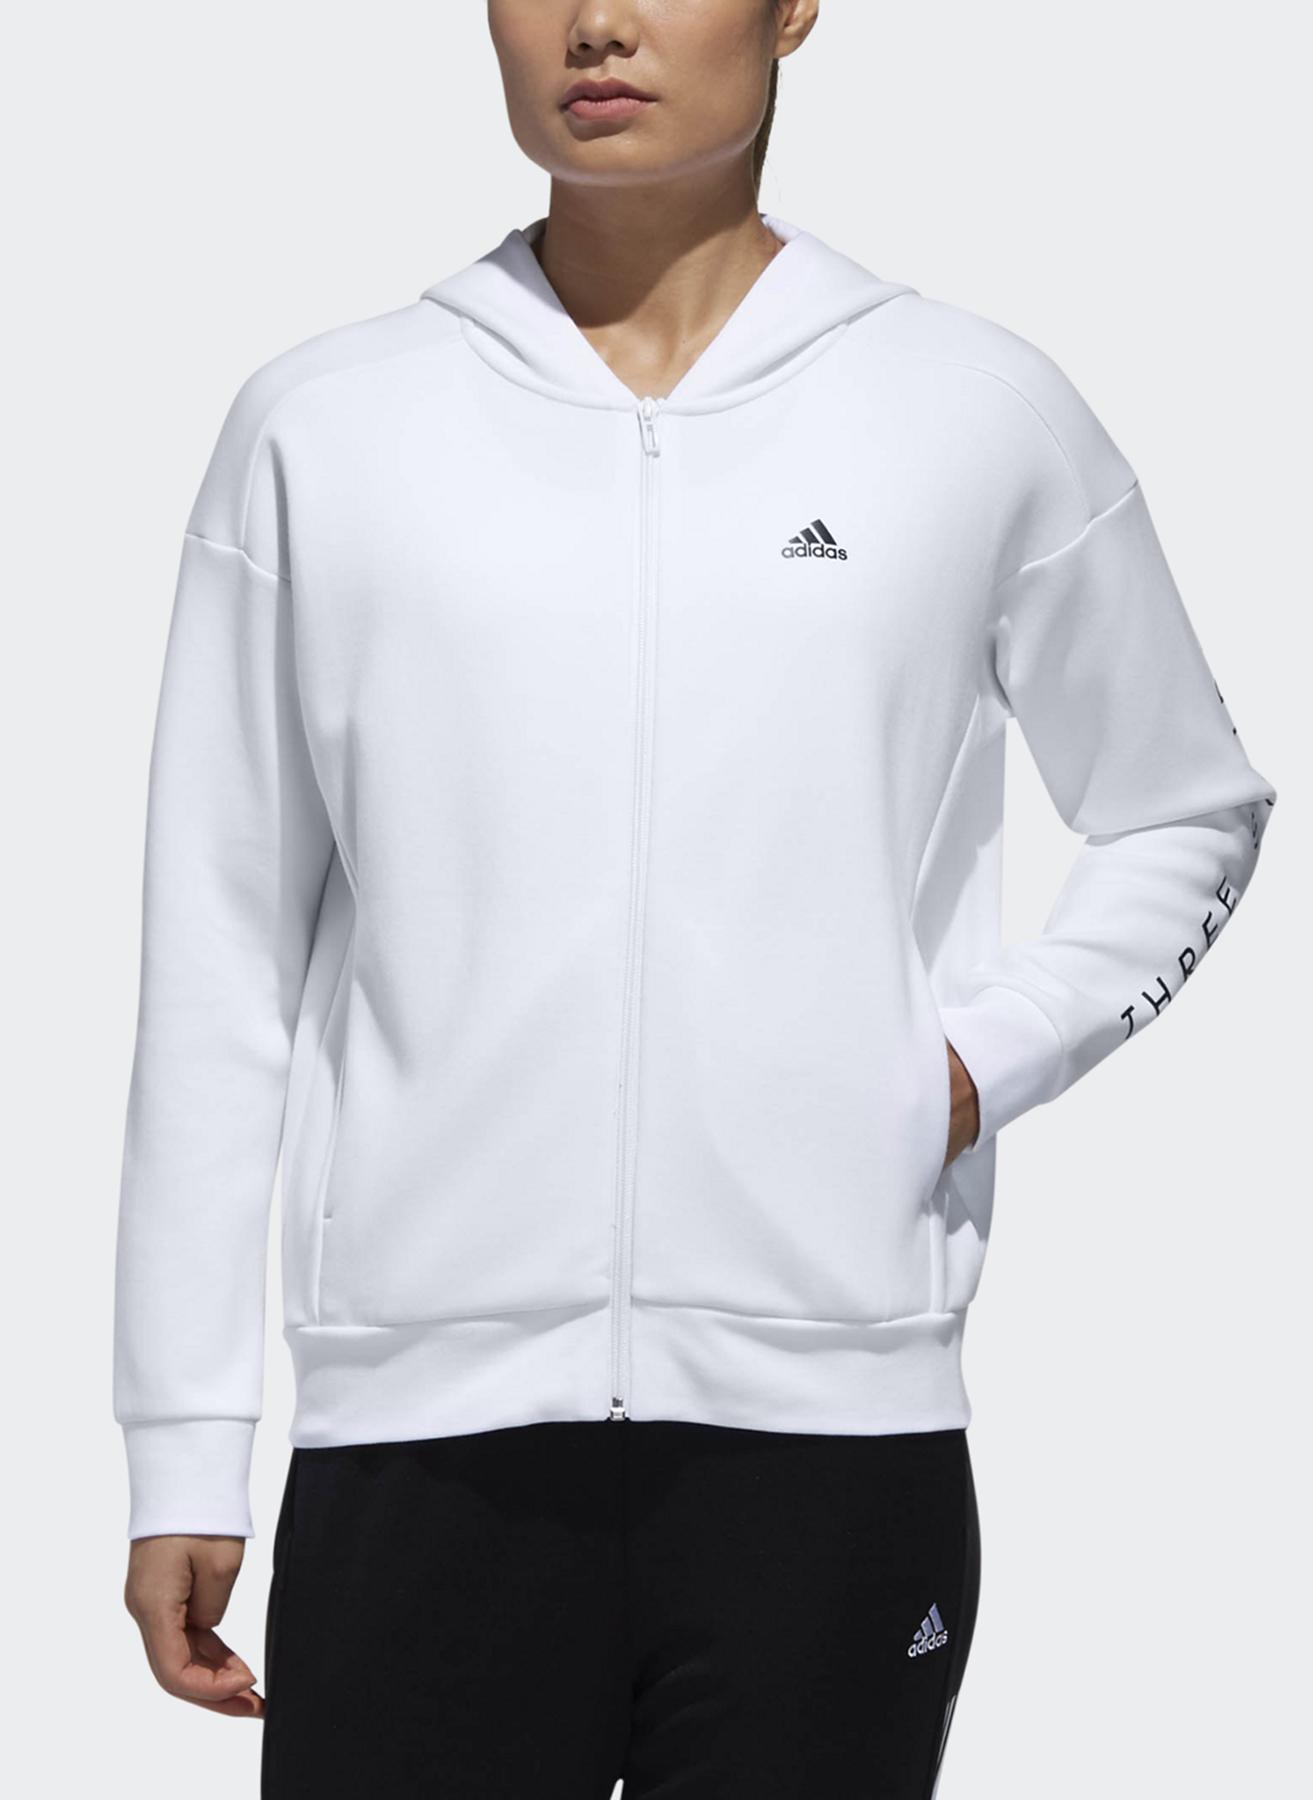 84c777c5dc132 S Beyaz adidas Sport 2 Street Knit Zip Ceket 5002357381003 Kadın Giyim Mont